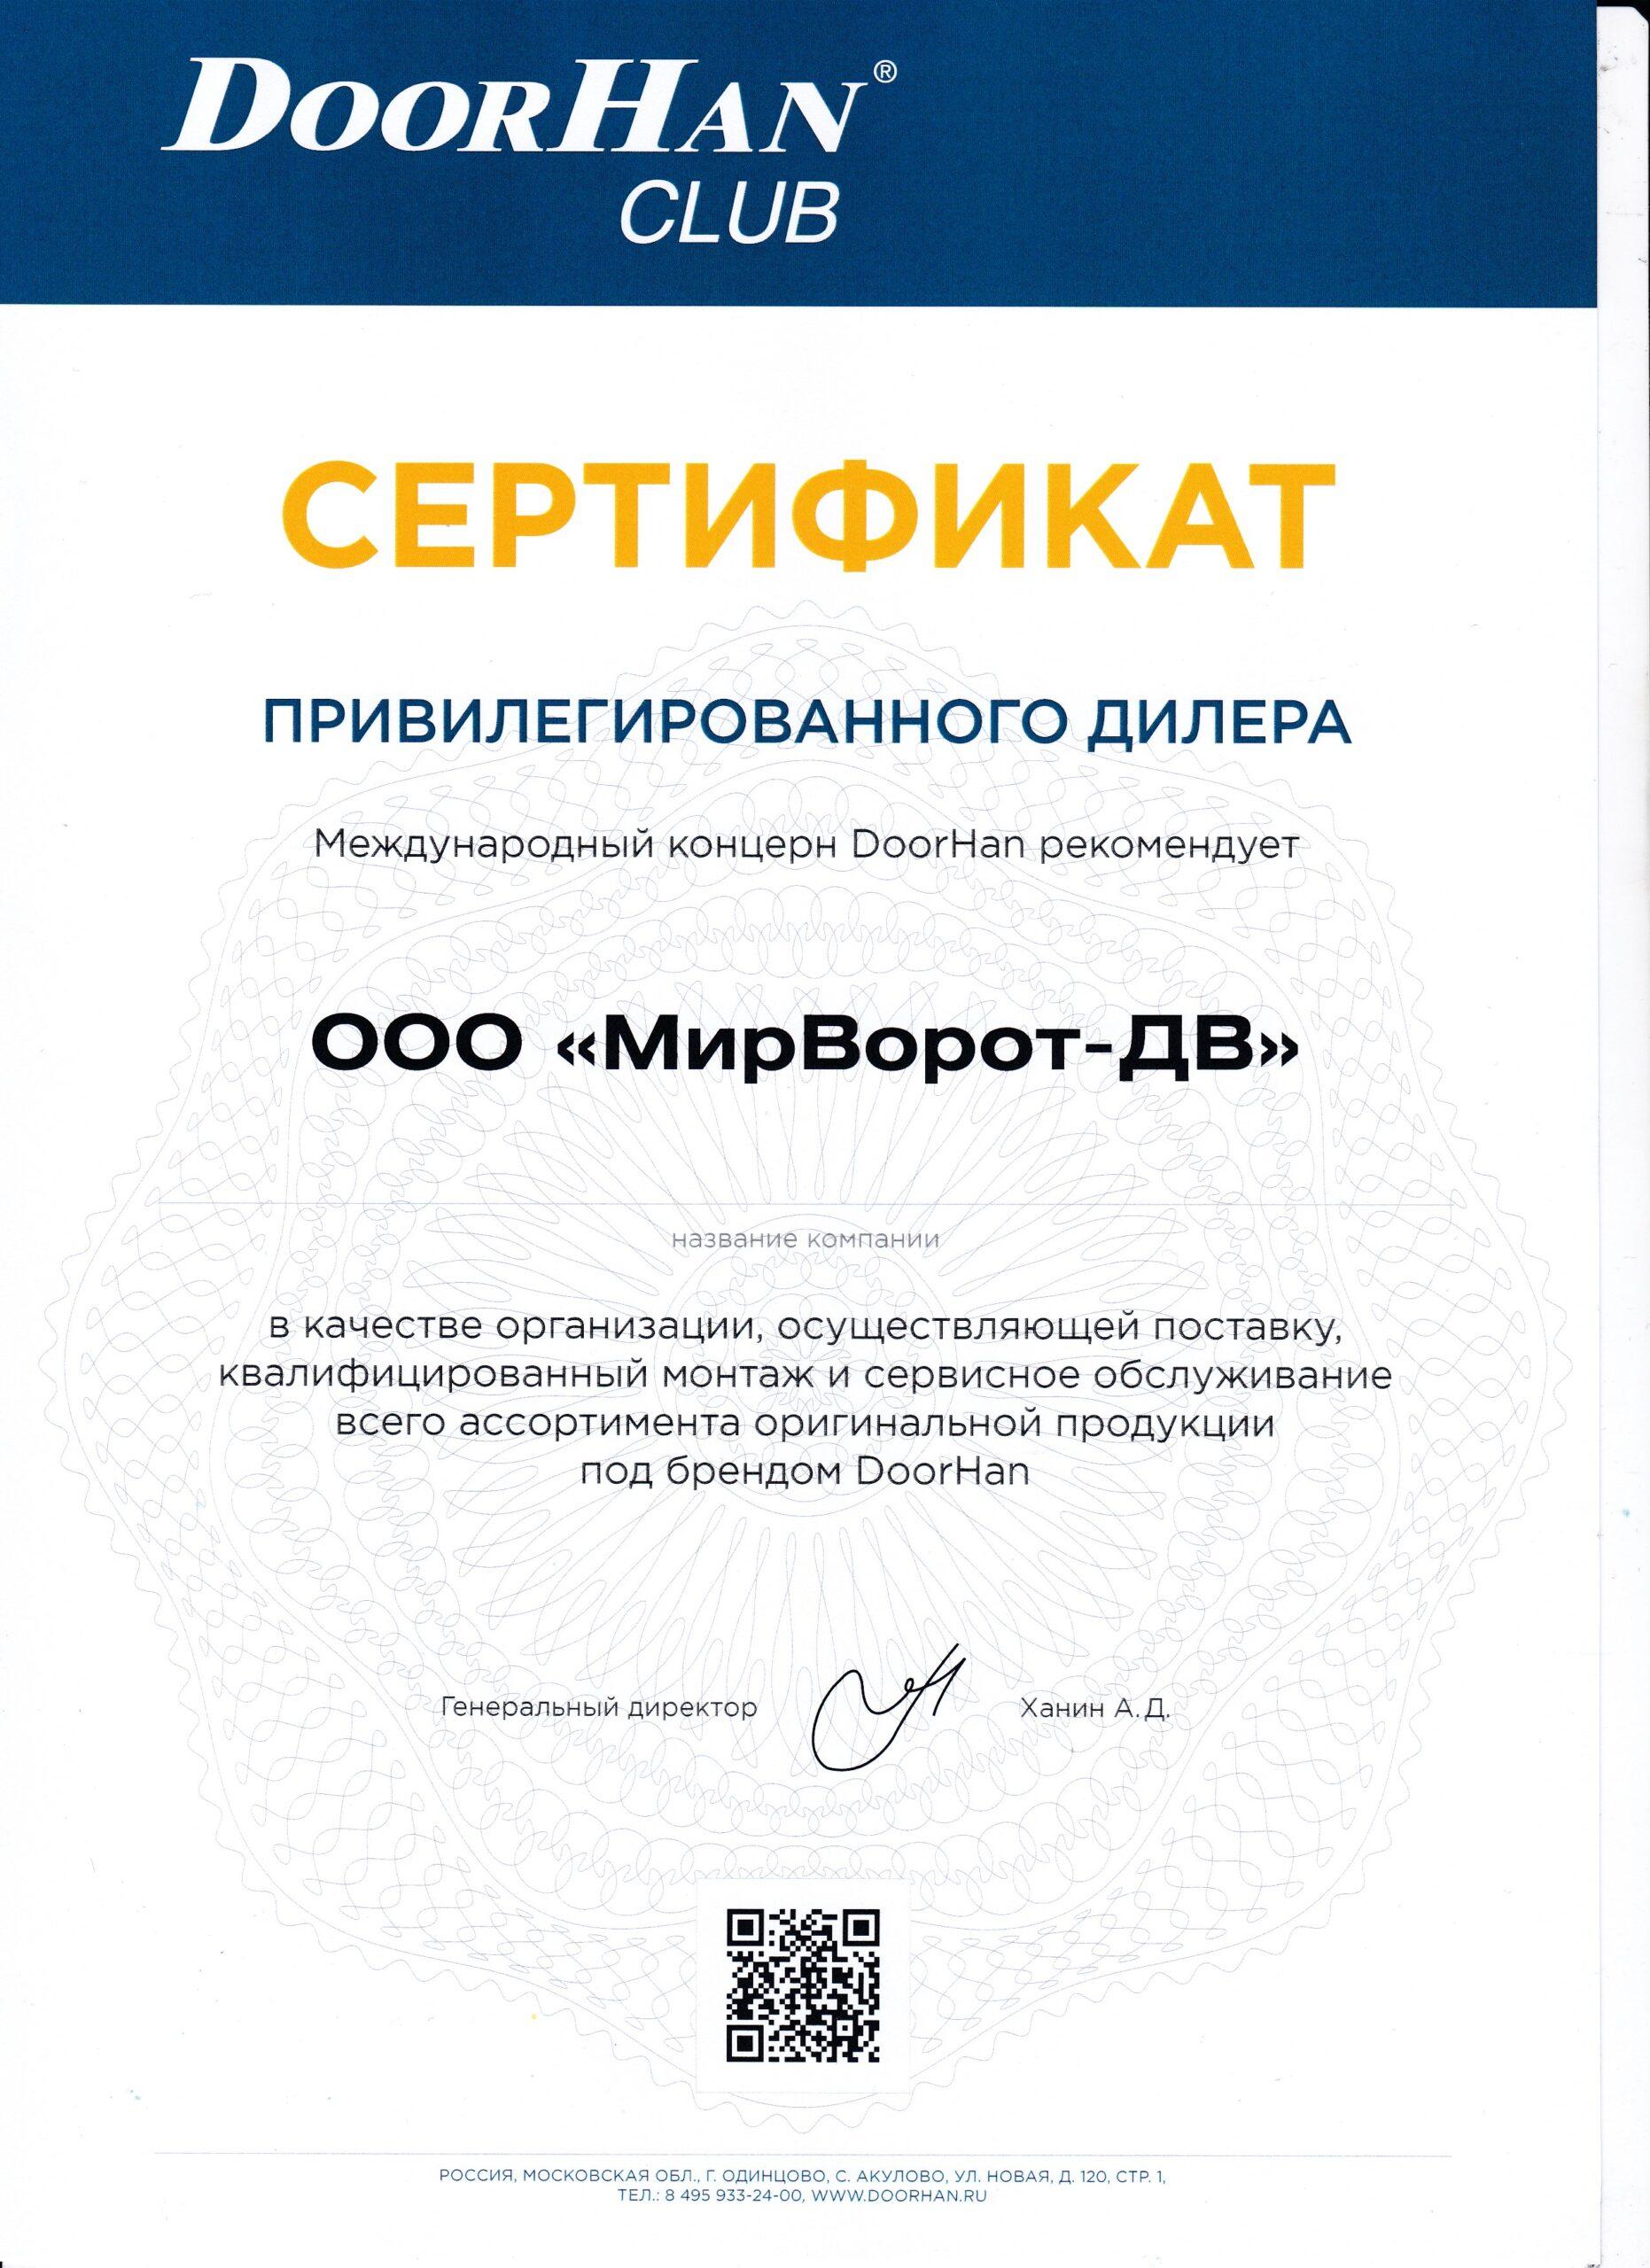 IMG_20210521_0002